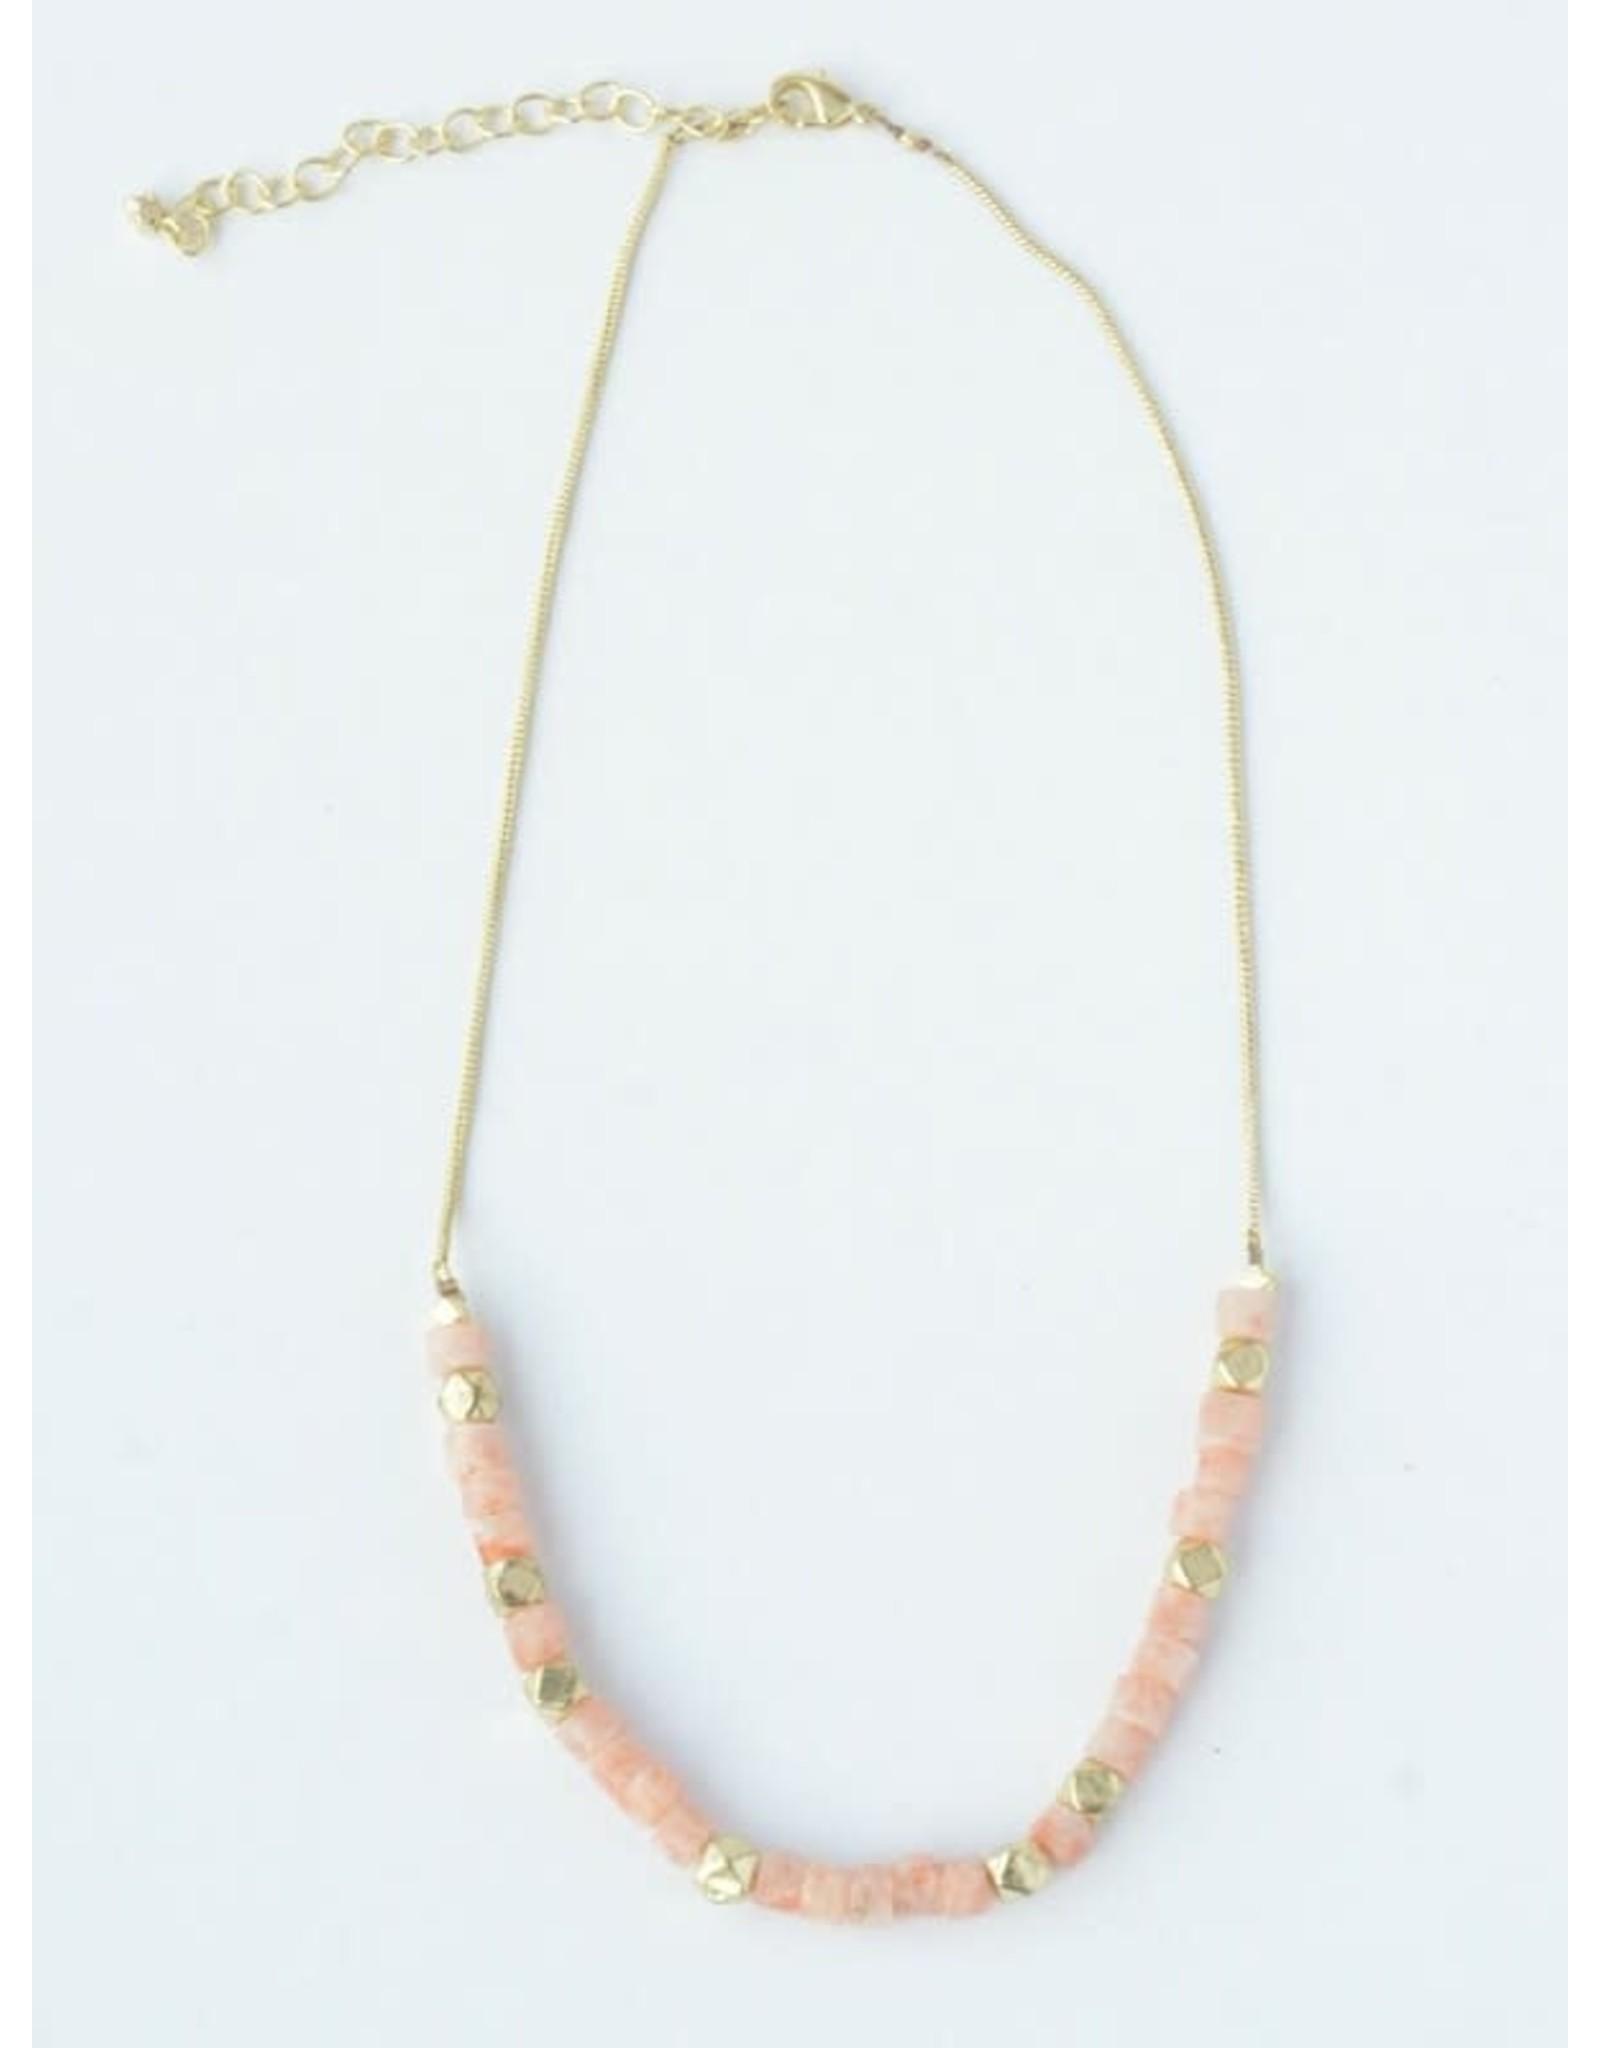 Fair Anita Sand Glass Necklace, India